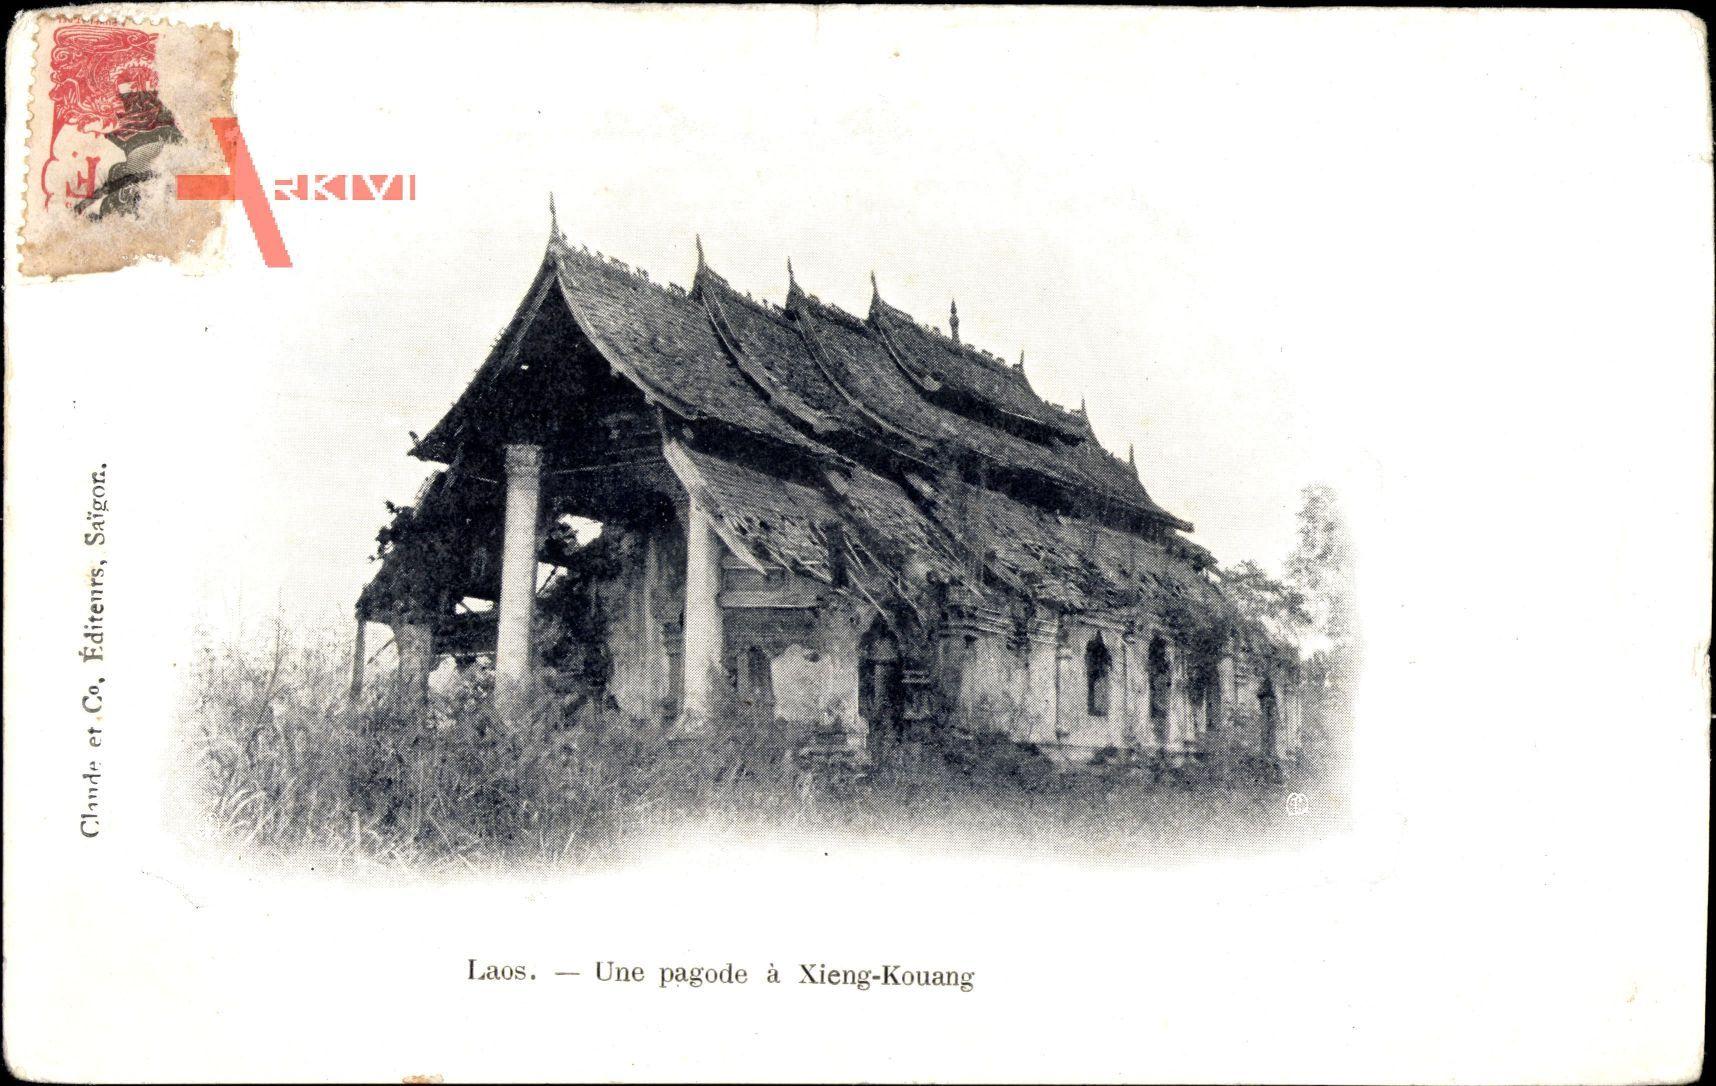 Xien Kouang Laos, Une pagode, Blick auf eine Pagode, Tempel